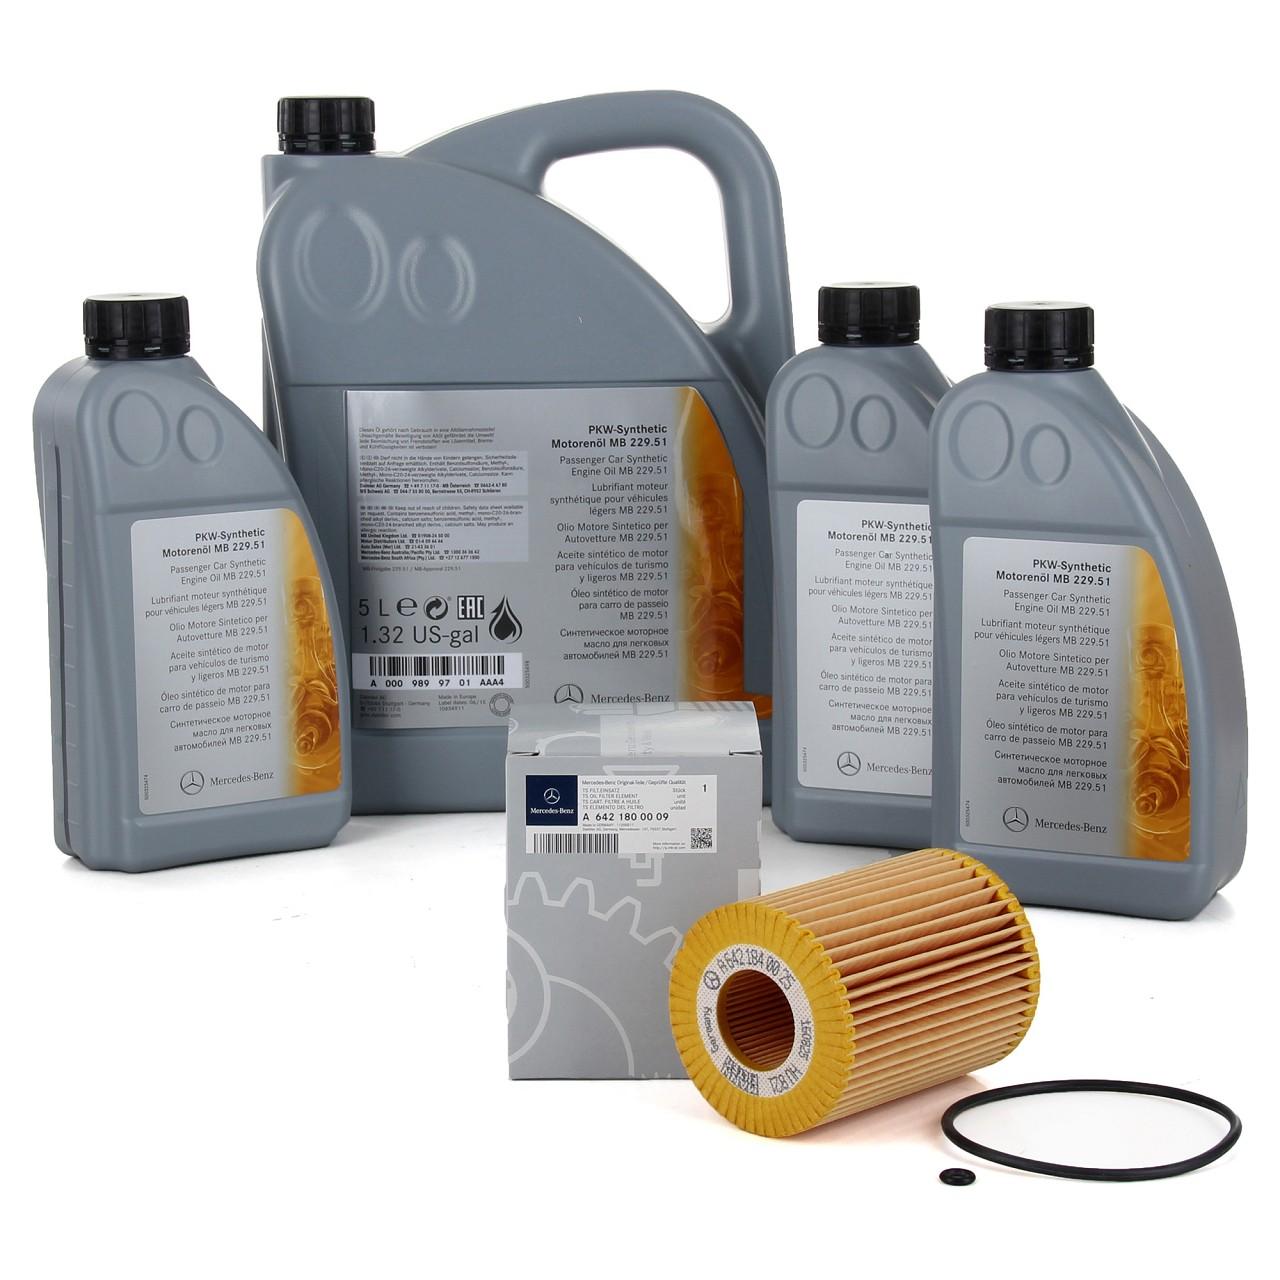 ORIGINAL Mercedes-Benz ÖL Motoröl 5W30 MB 229.51 8 Liter + Ölfilter 6421800009